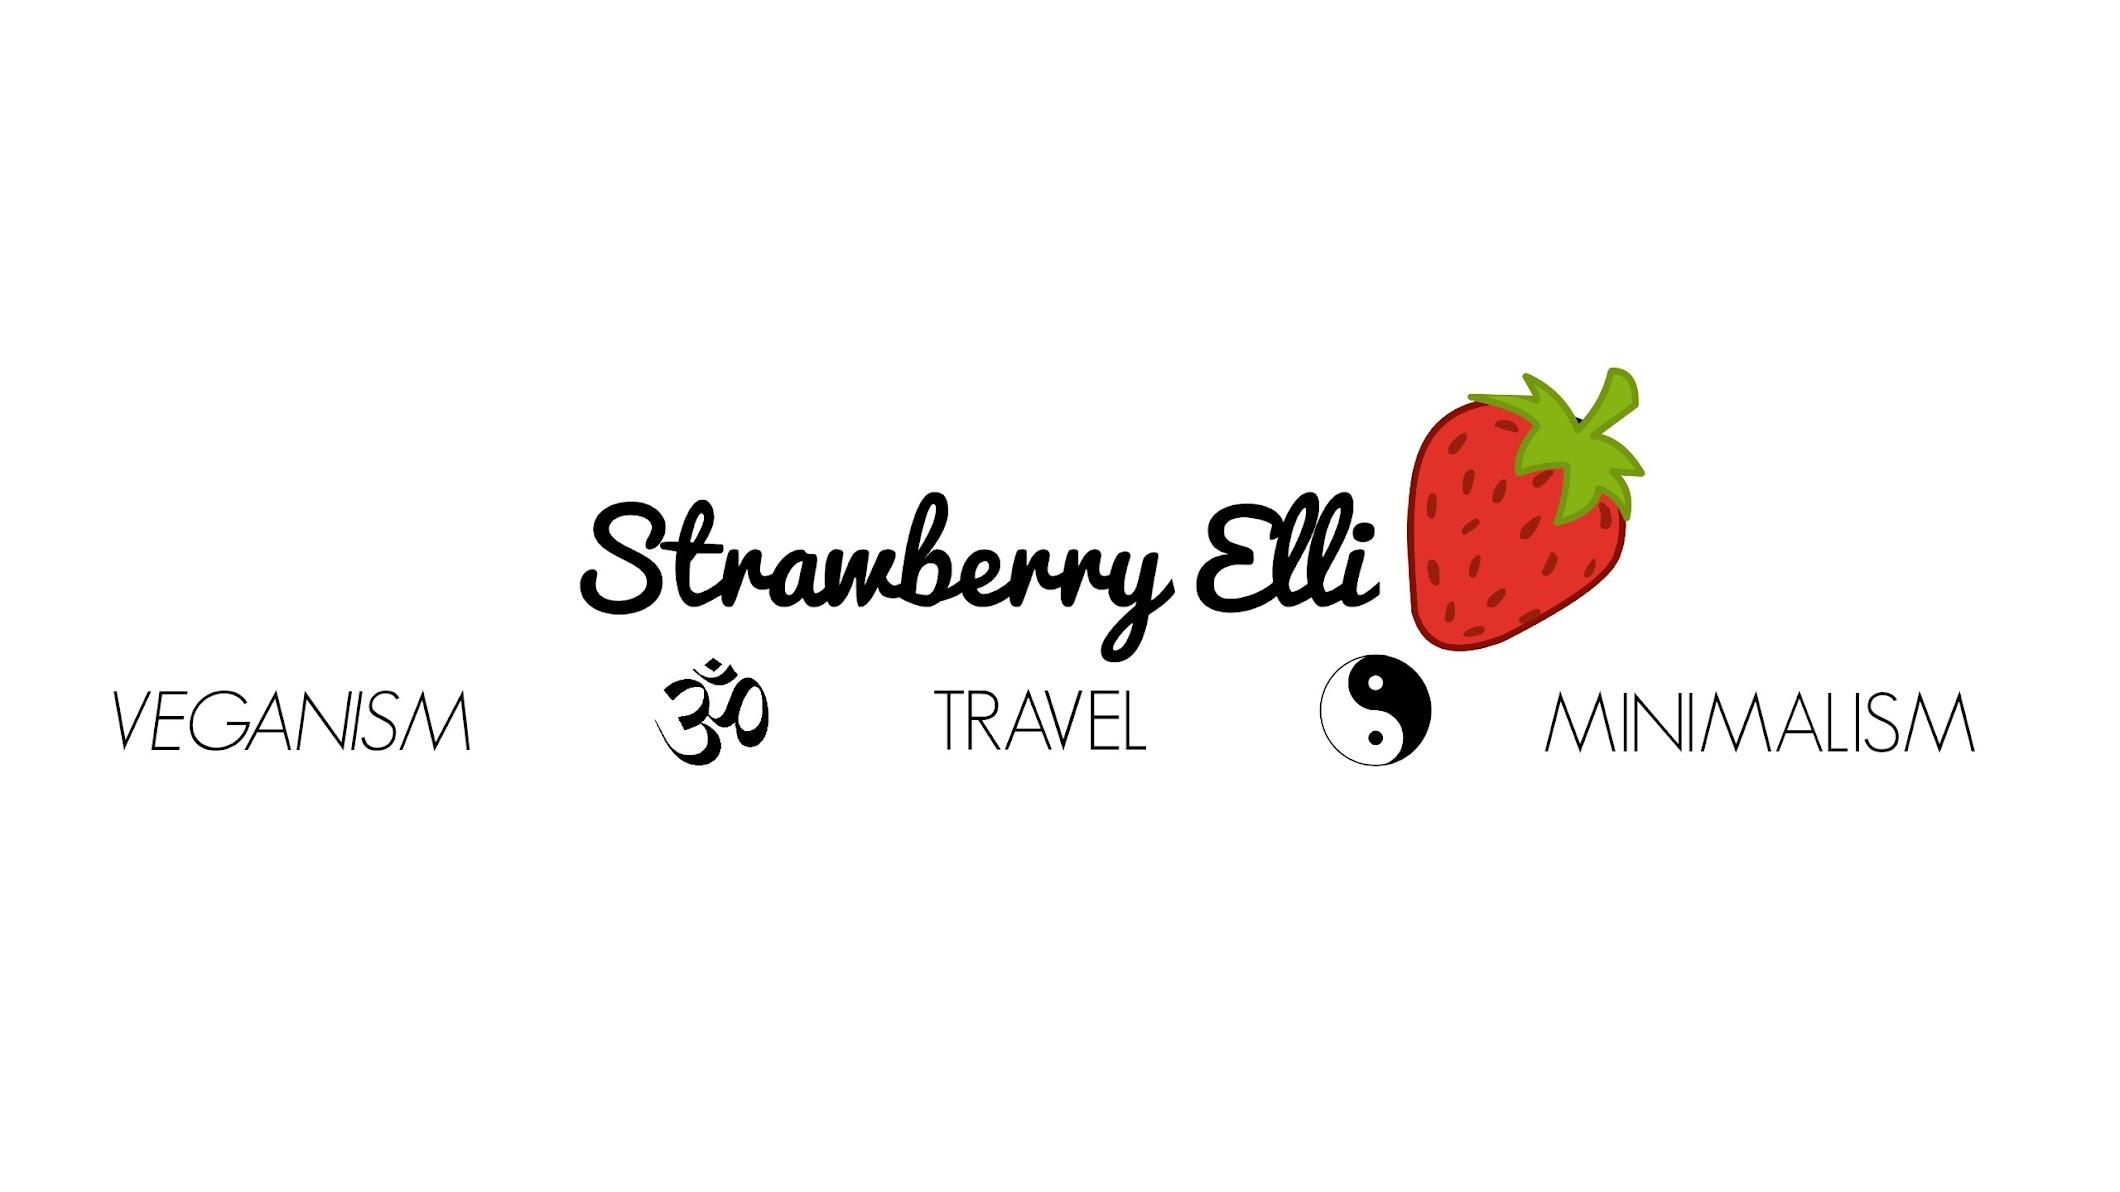 d9cce9eec2b7 Strawberry Elli - YouTube